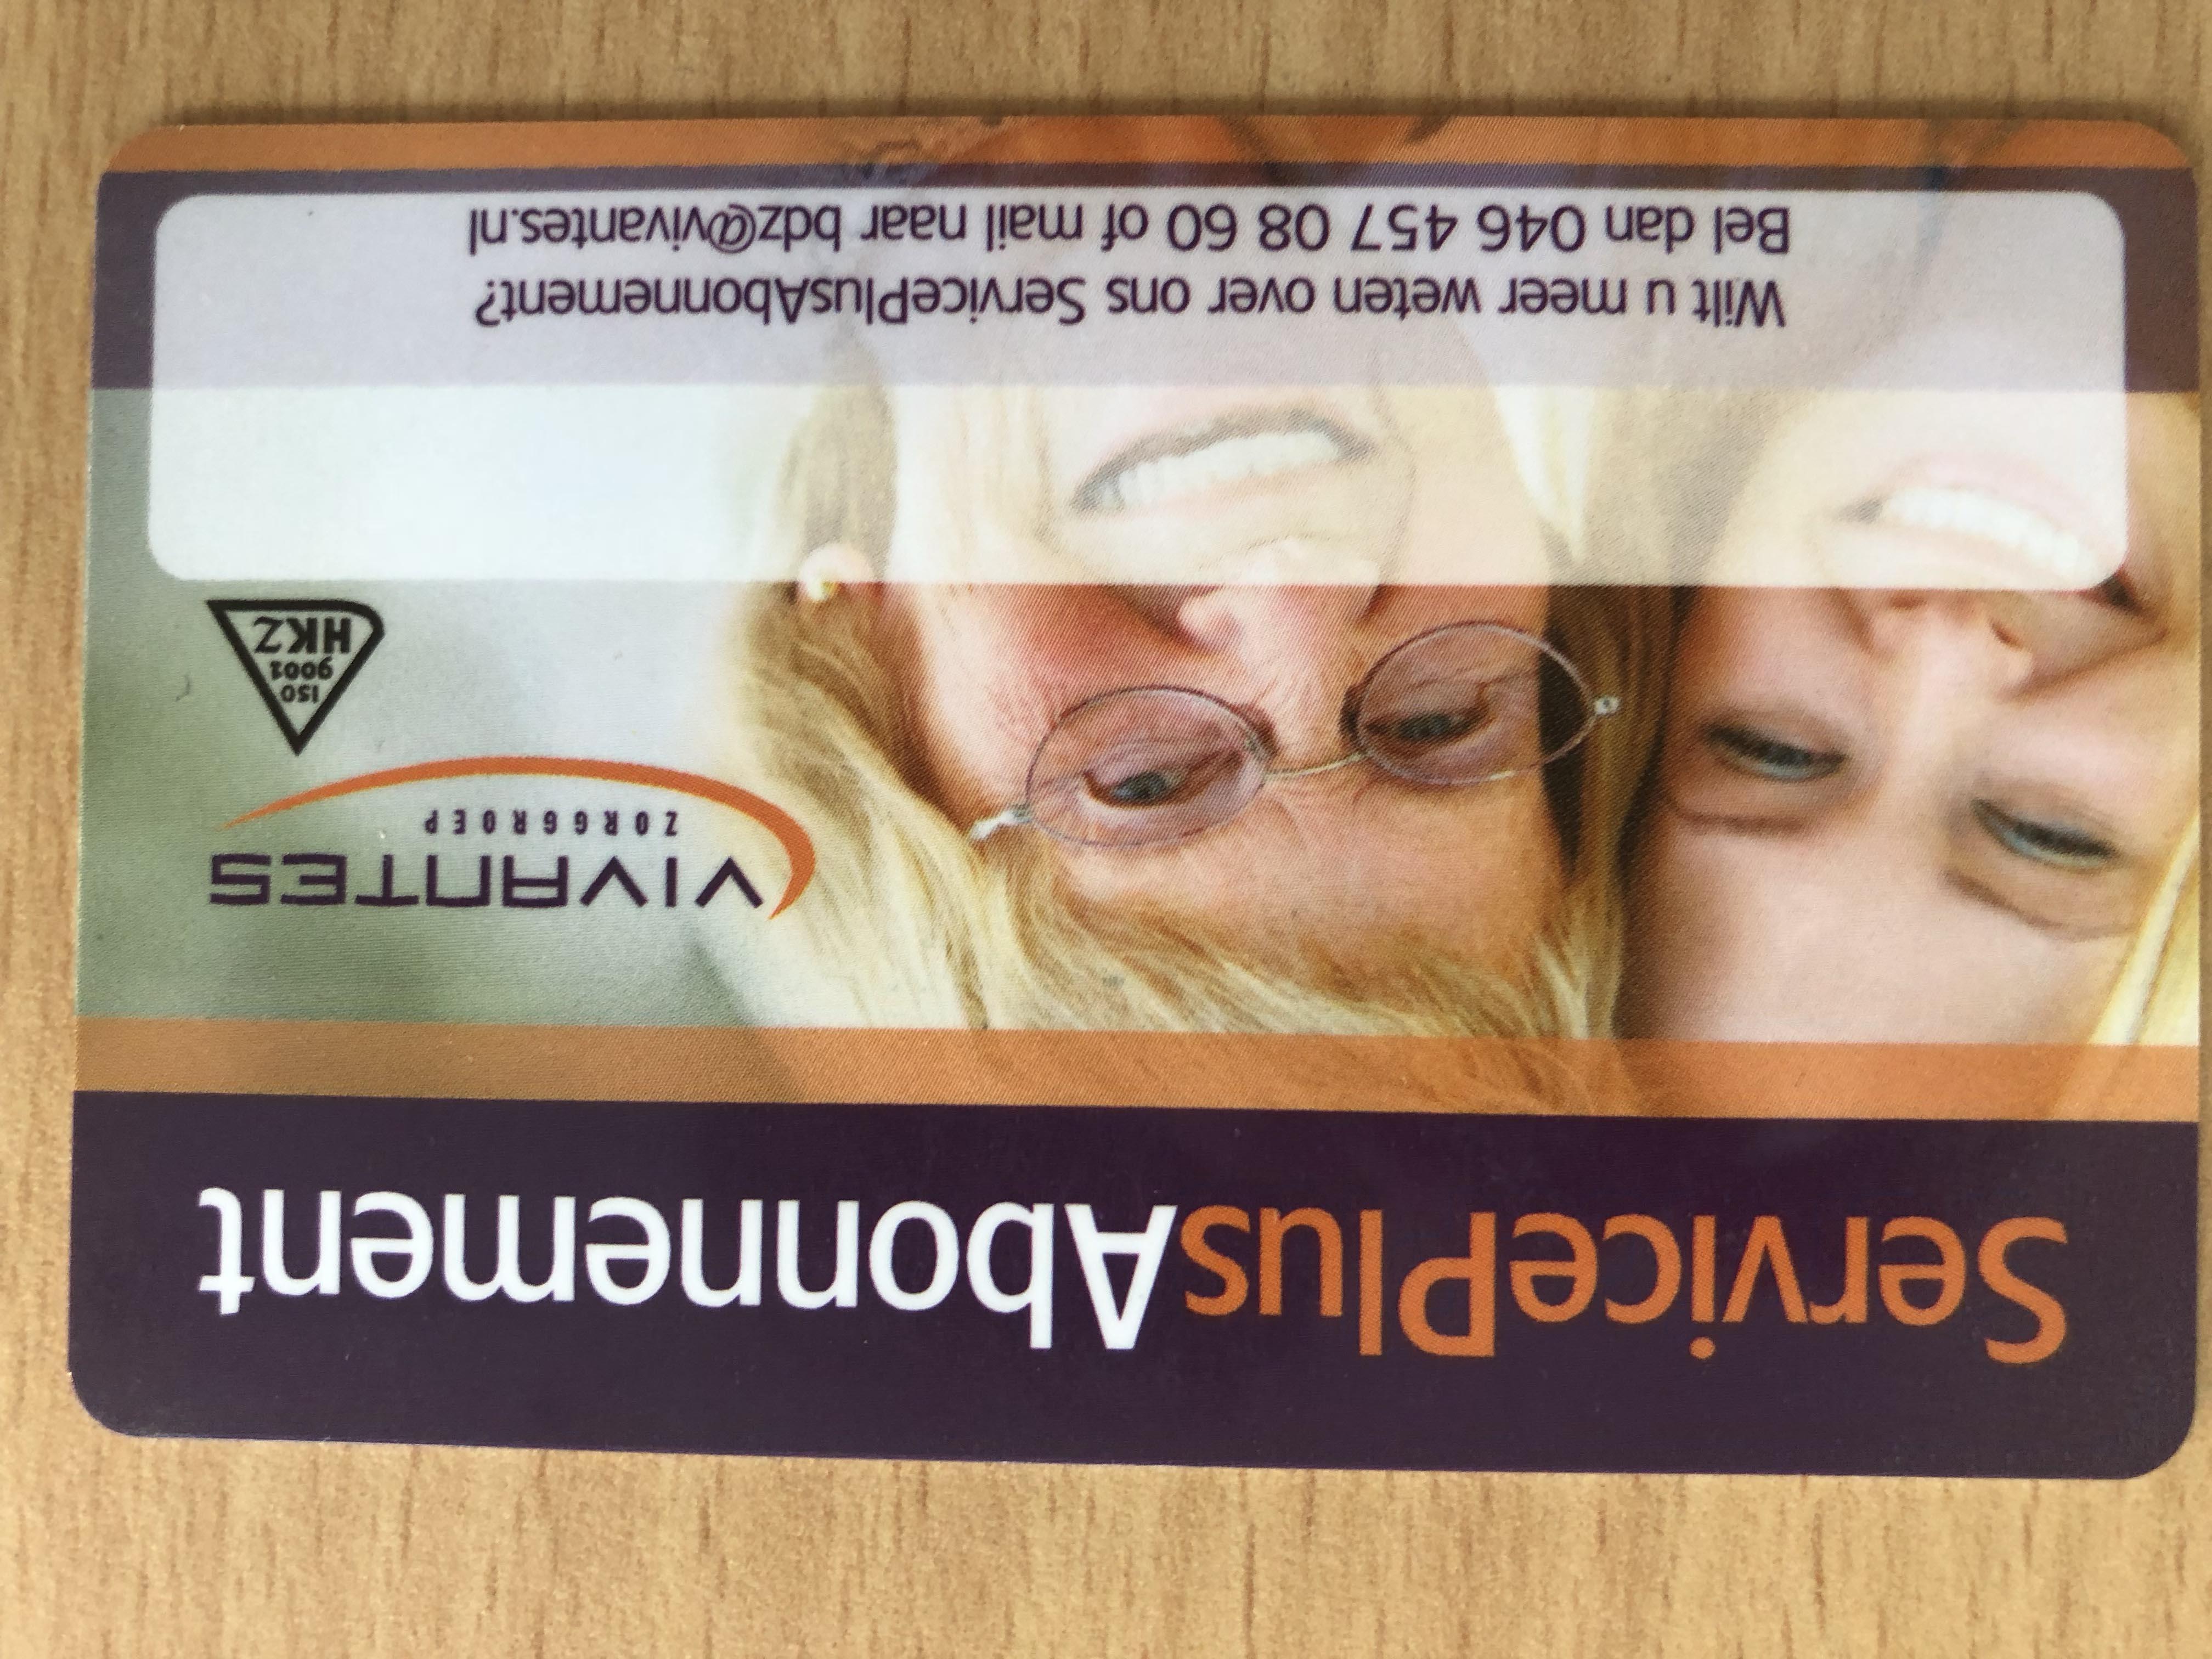 Aanbieder ledenpassen: ServicePlusAbonnement van Vivantes